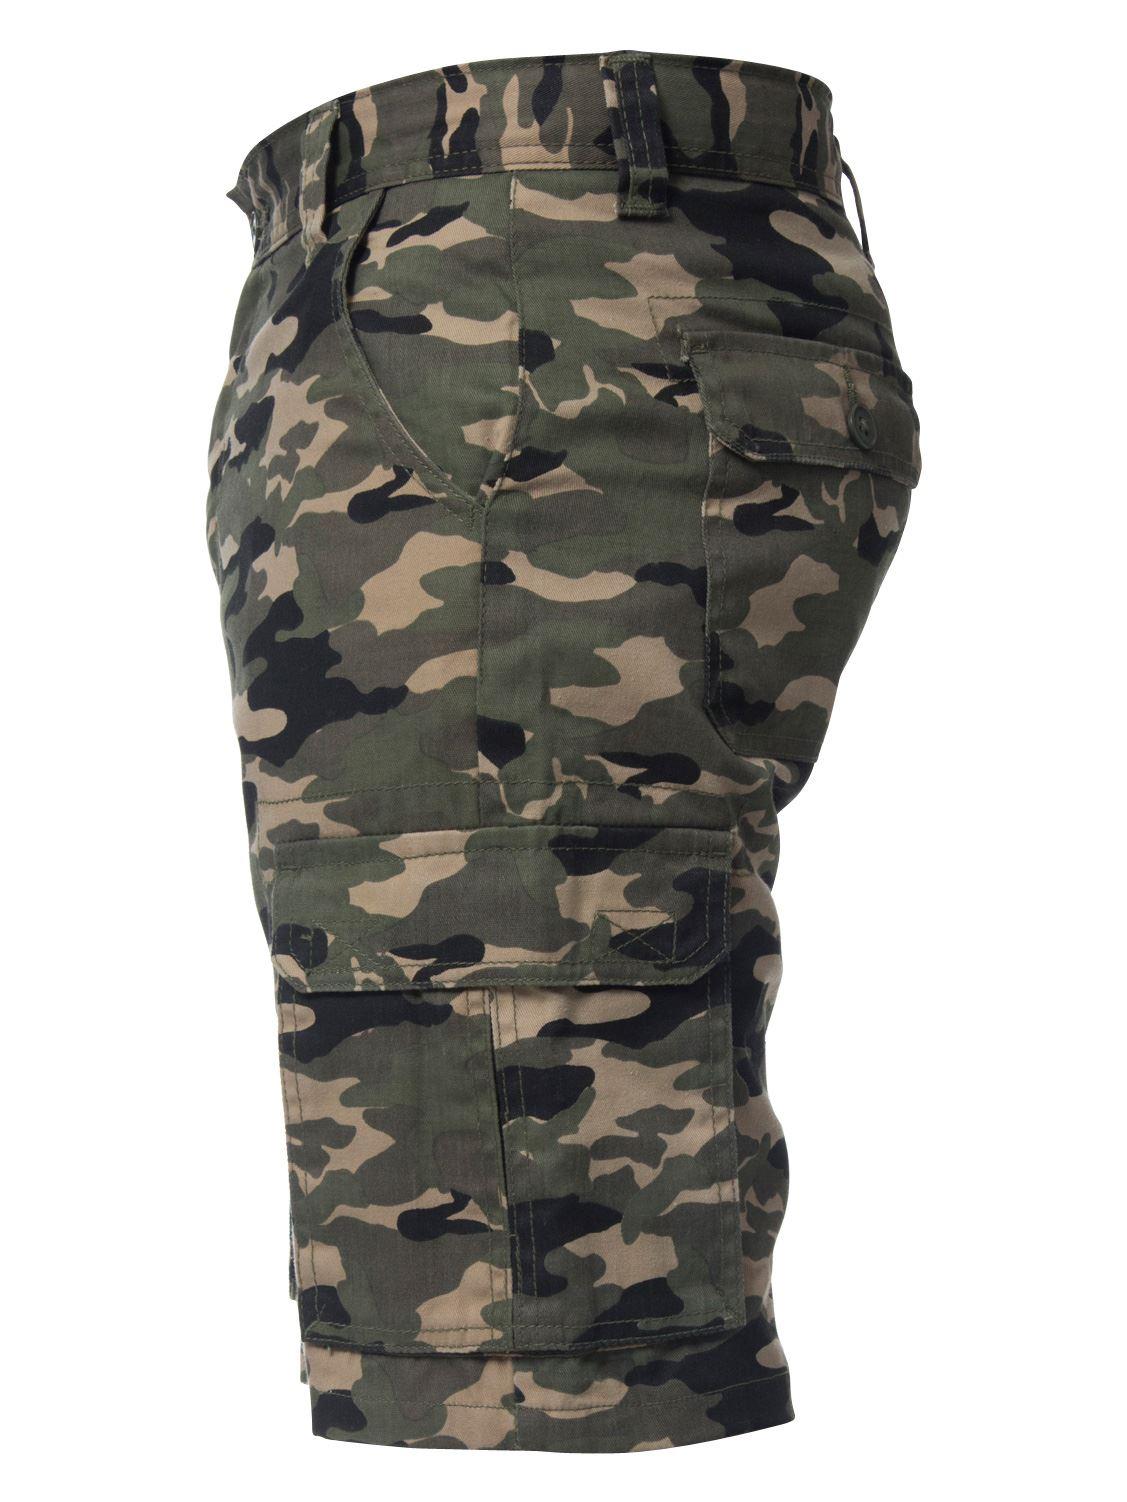 Kruze-Jeans-para-Hombre-Pantalones-Cortos-Combate-del-ejercito-camuflaje-Camo-Trabajo-Shorts miniatura 16